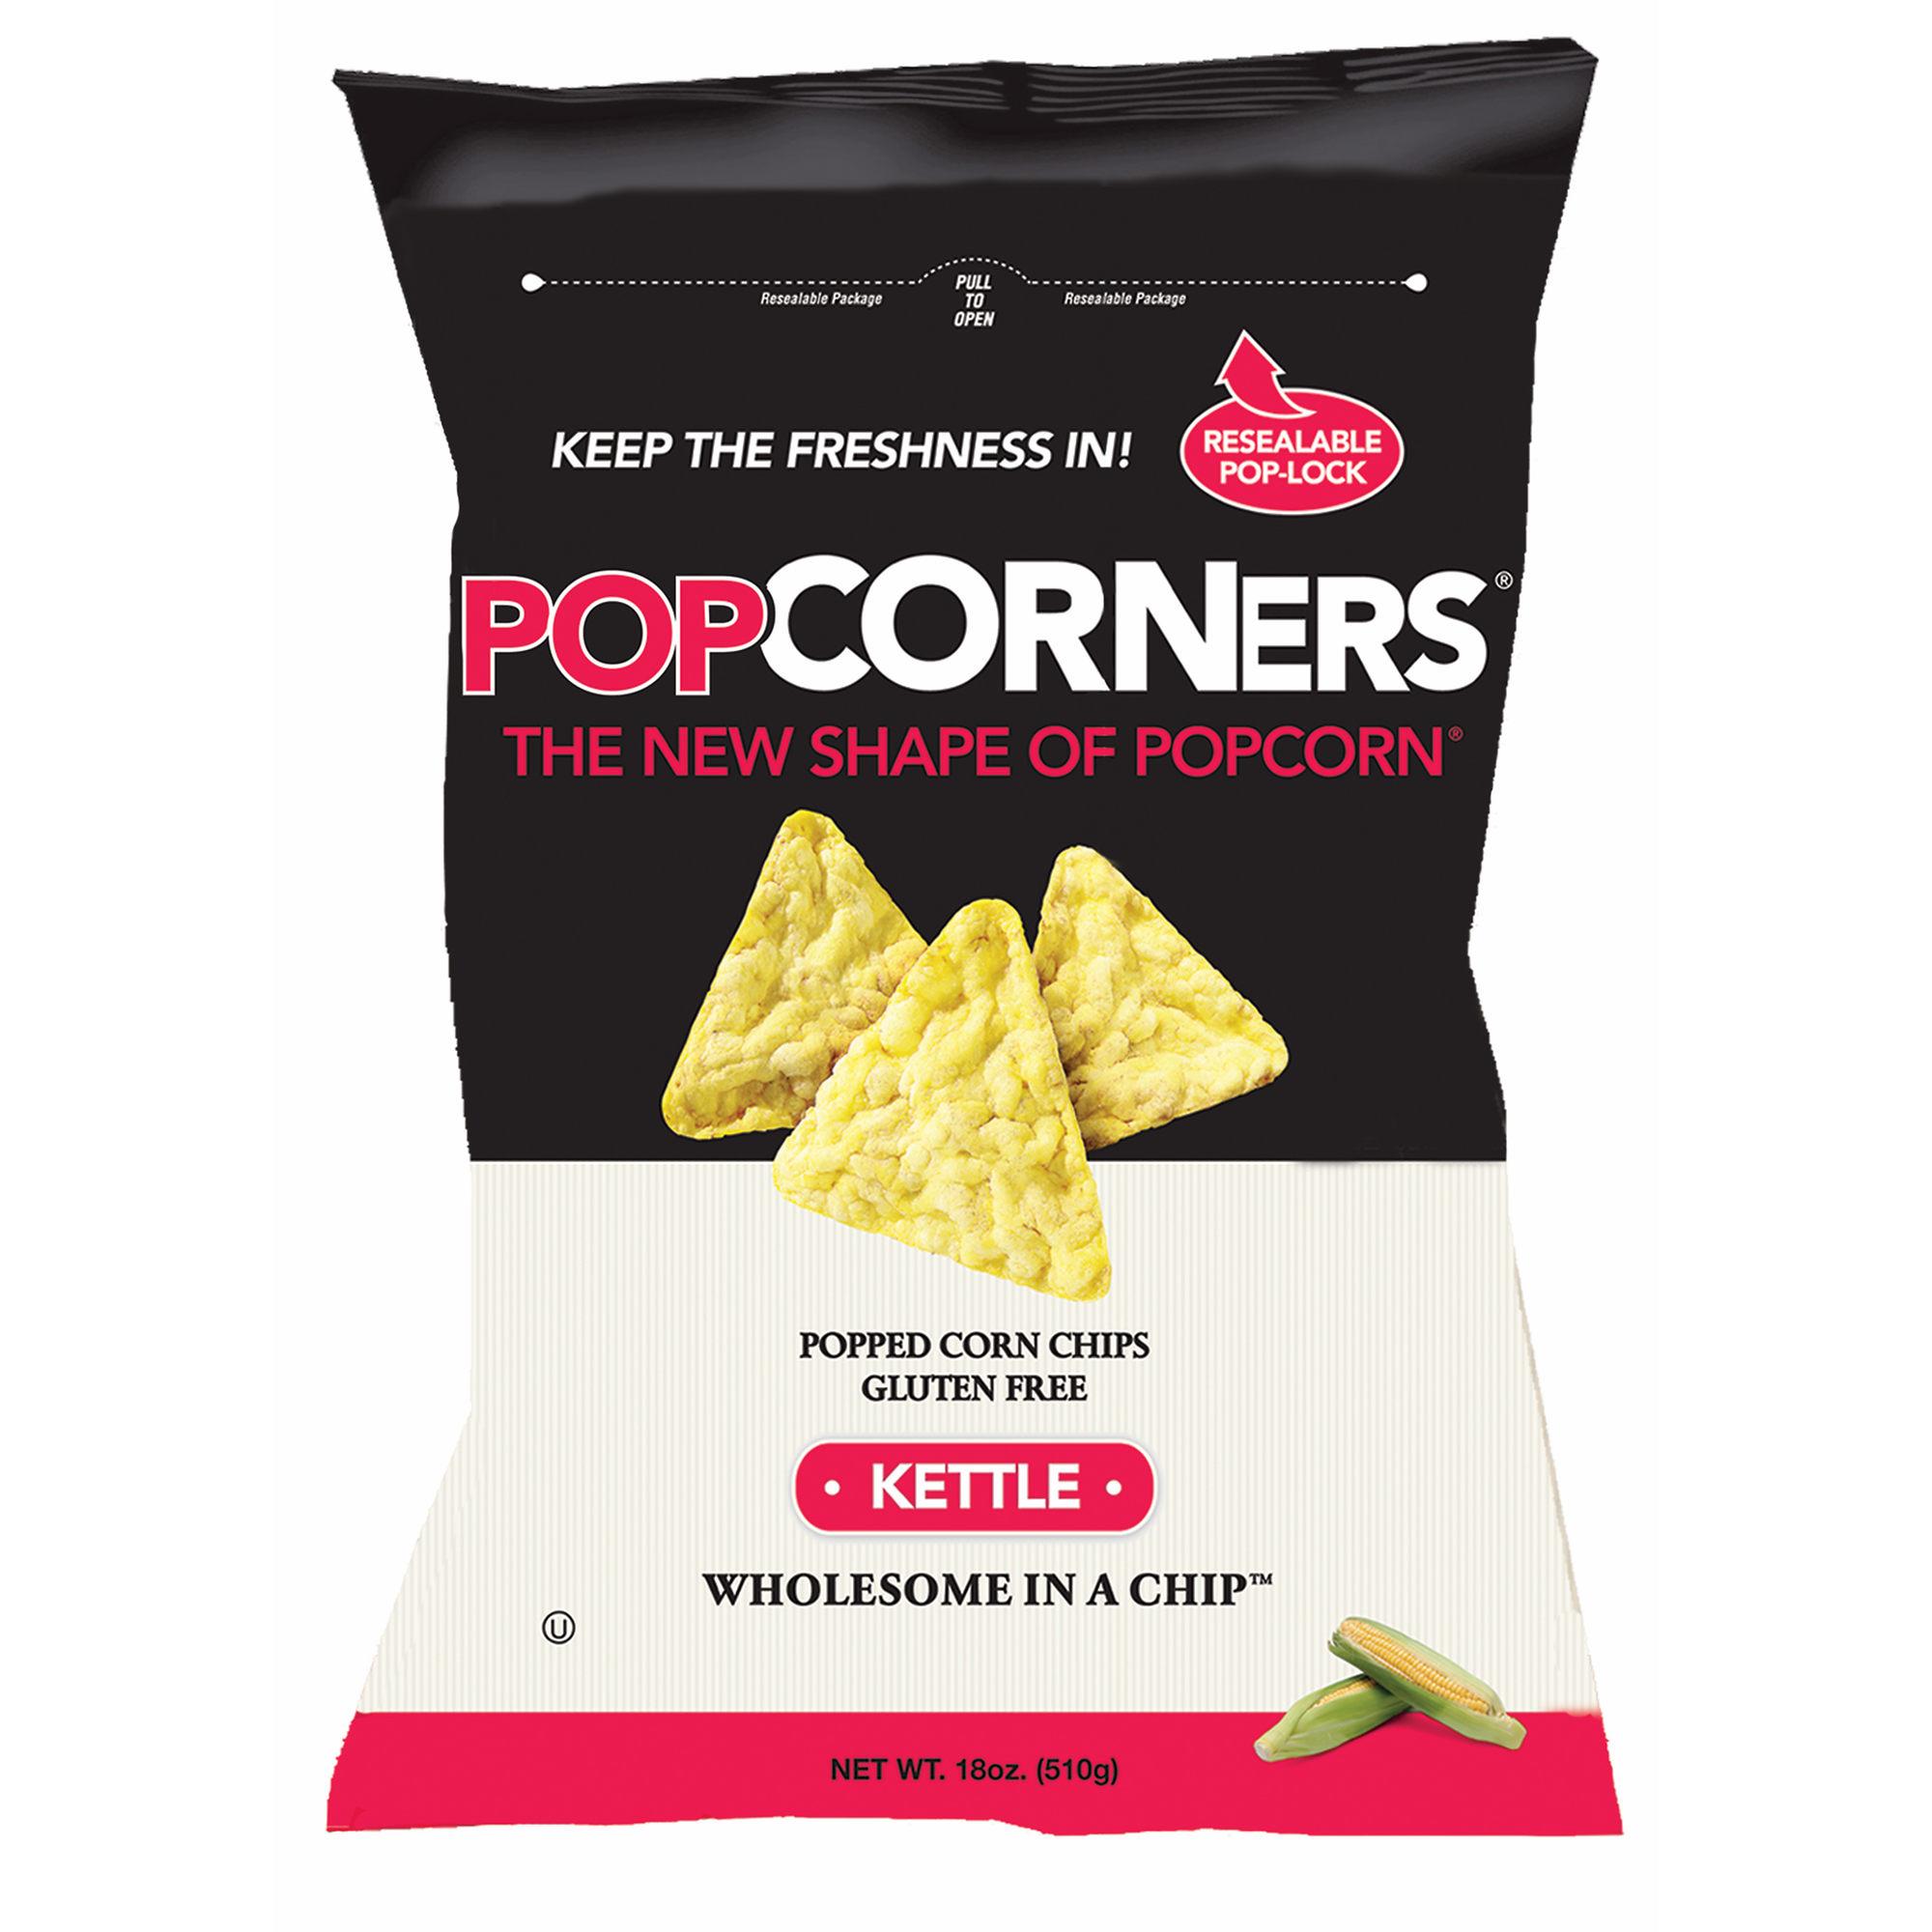 Pop Corners Kettle www.sundressesandsquats.com